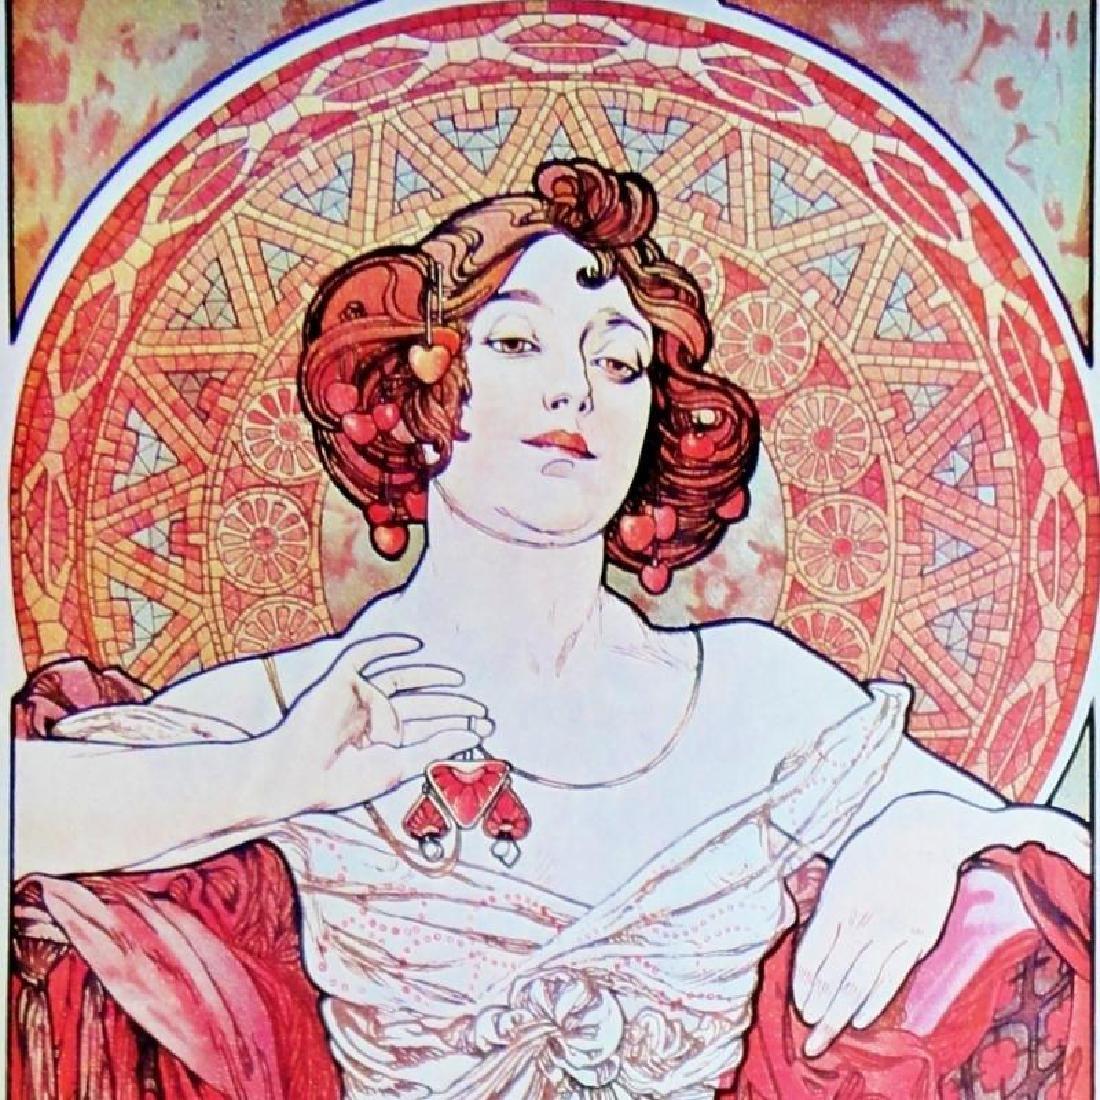 3 Large Mucha Repro Antique Poster Art Prints 48X18 - 7